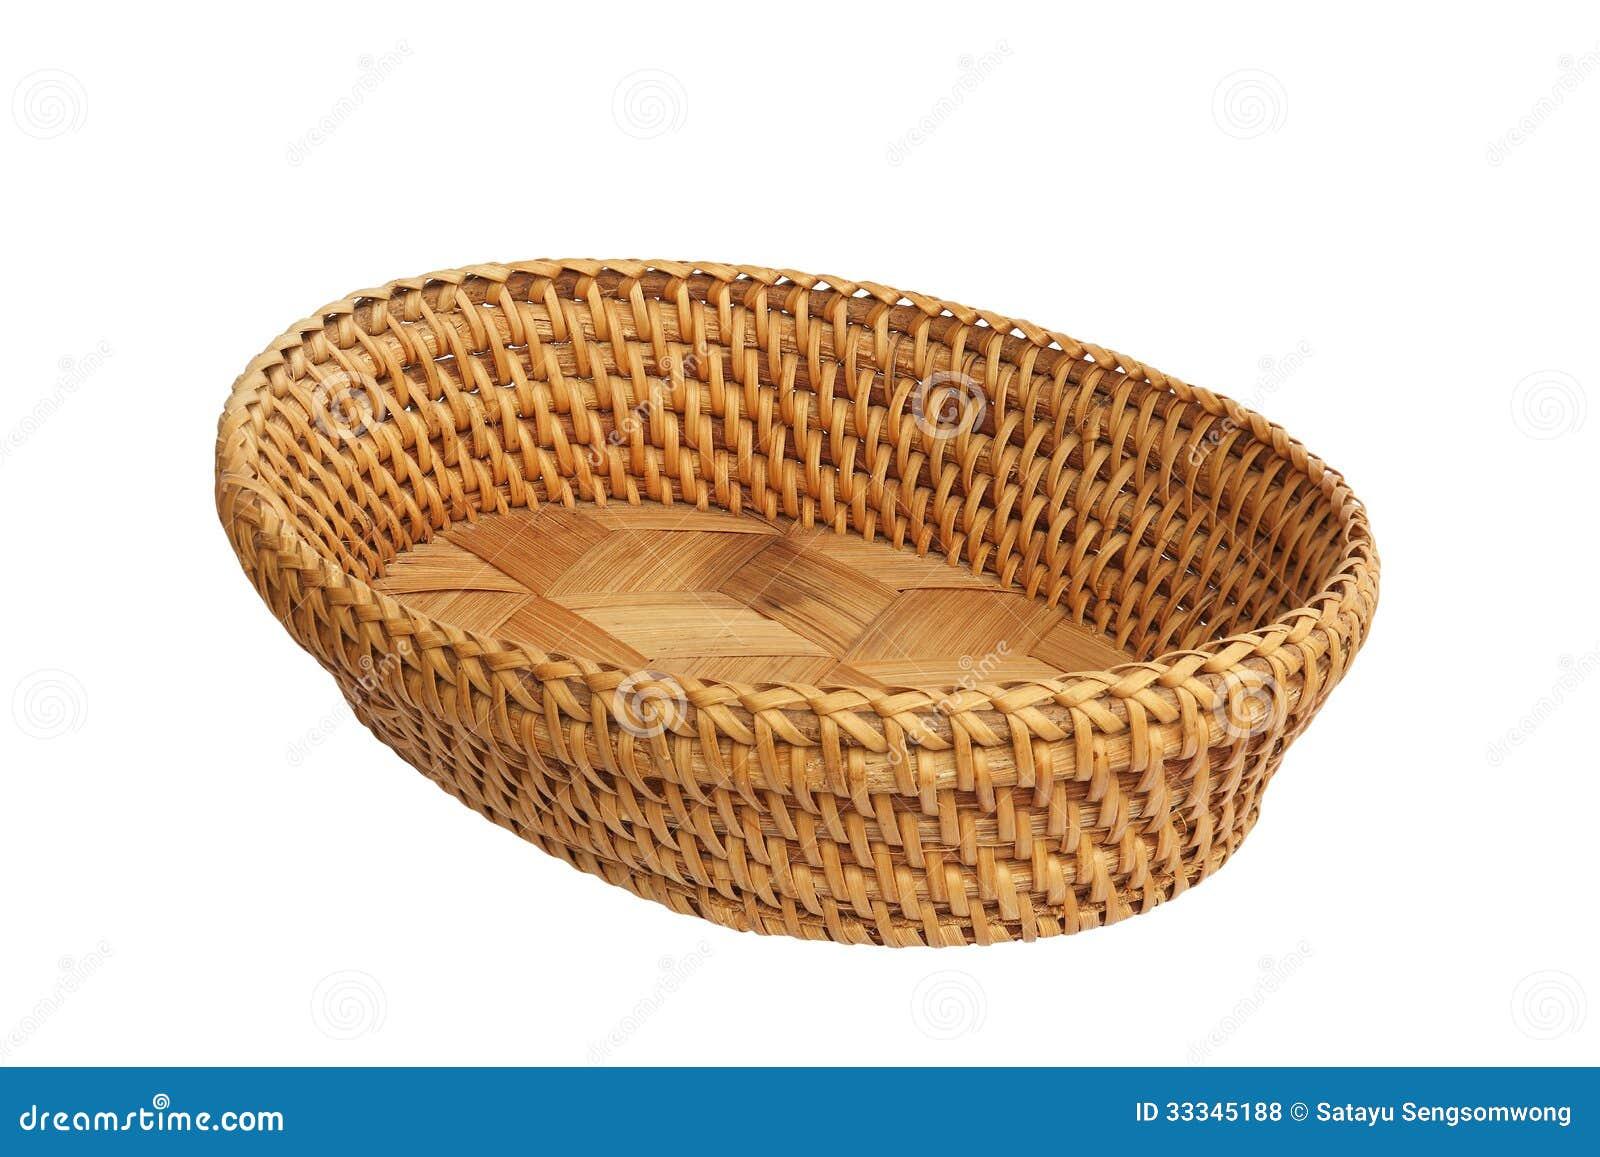 Over white background basket used for arrangement of flower or fruit